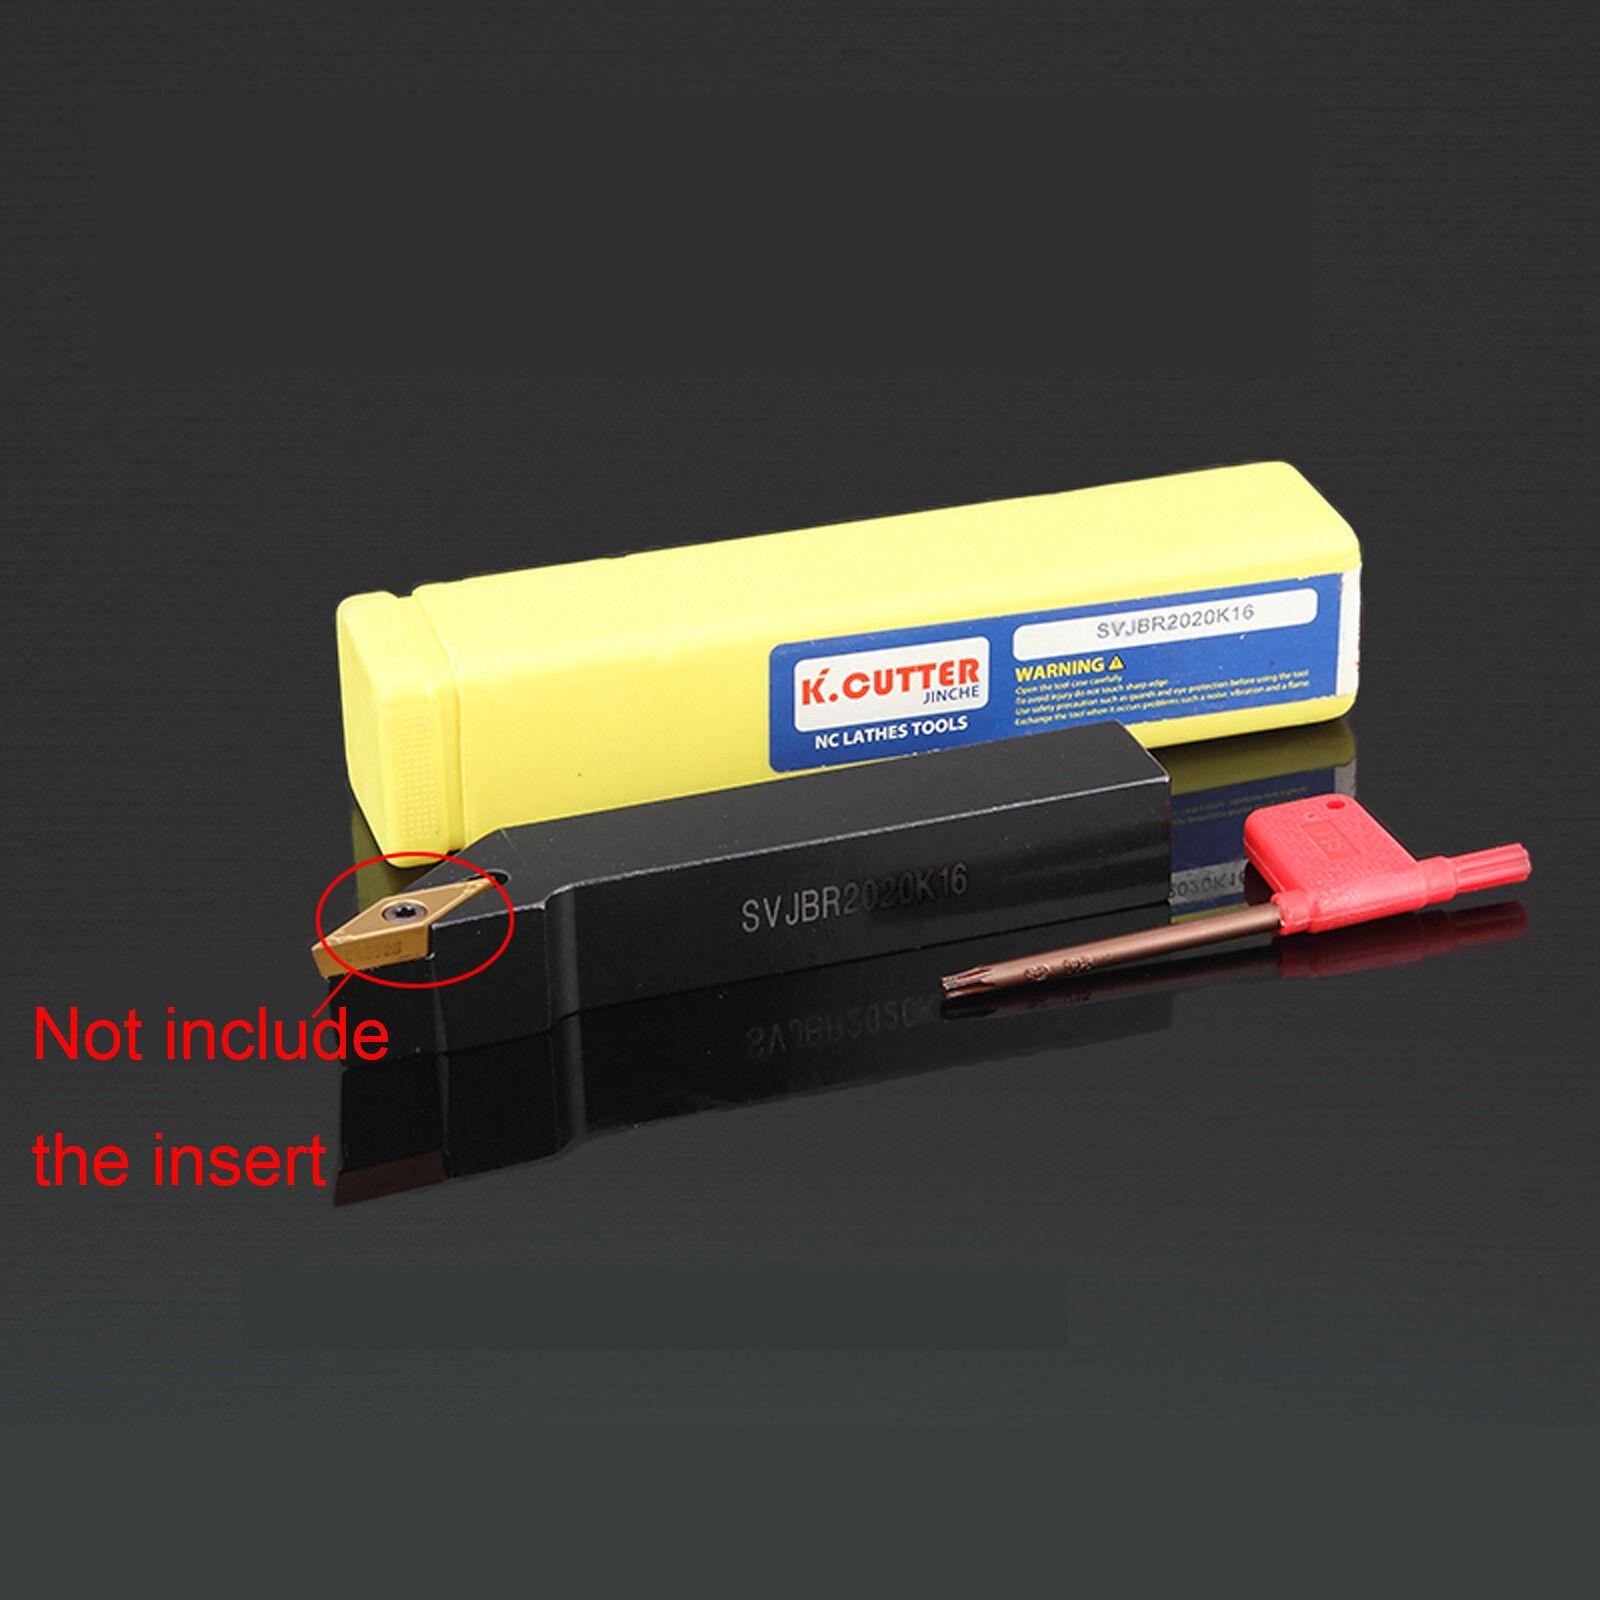 Gaobey SVJBR2525M11 turning tool holder For VBMT1103 Inserts